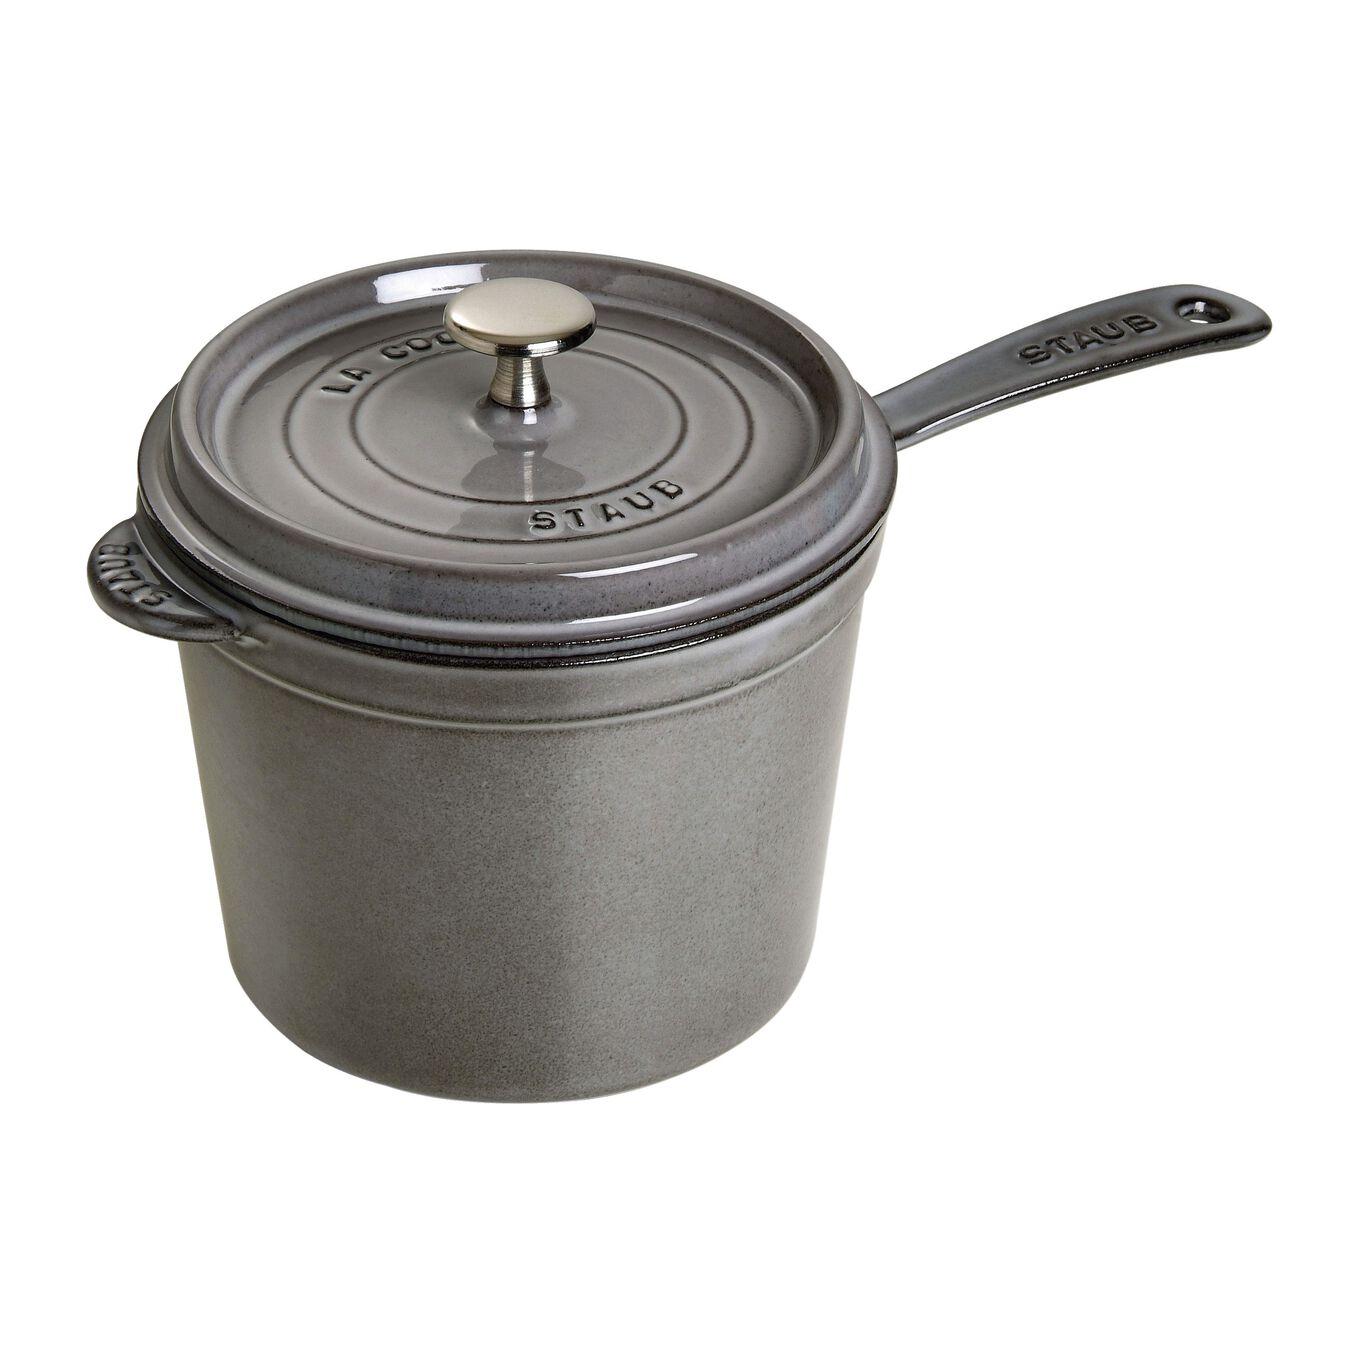 2,75 l Cast iron round Casserole, Graphite-Grey,,large 2